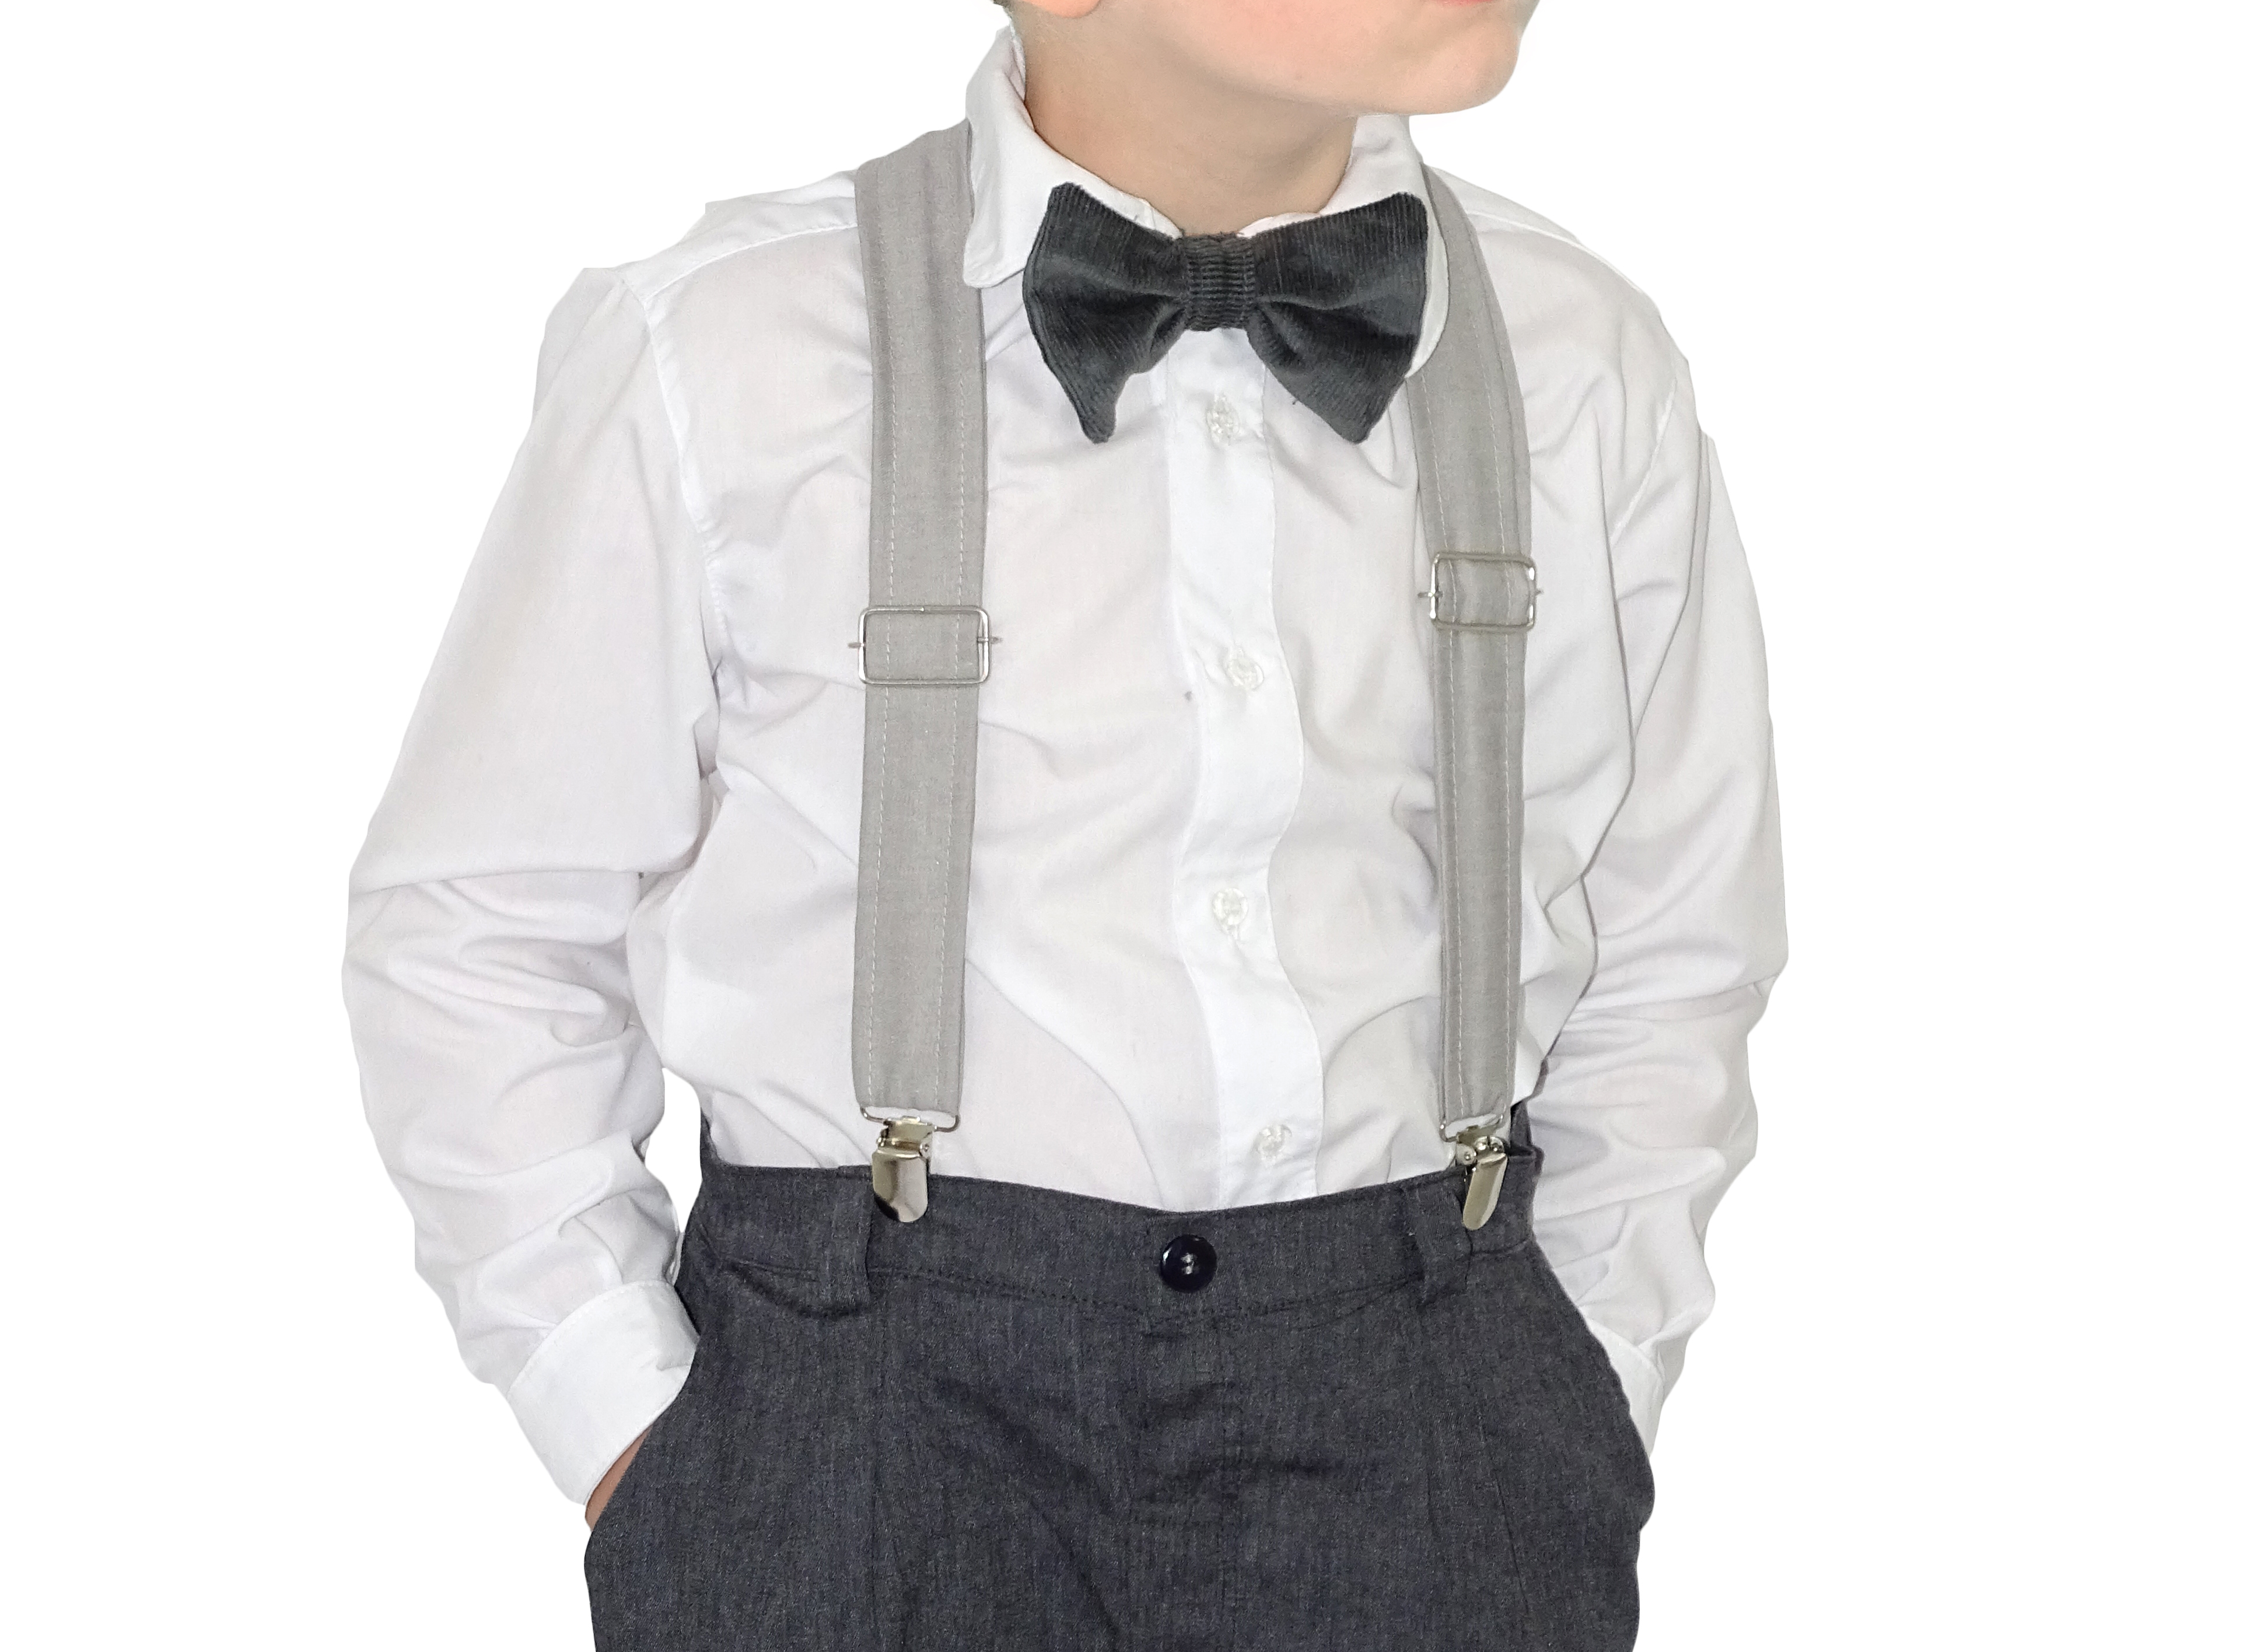 4b1bfa6b96 Camisa Branca Social Infantil no Elo7